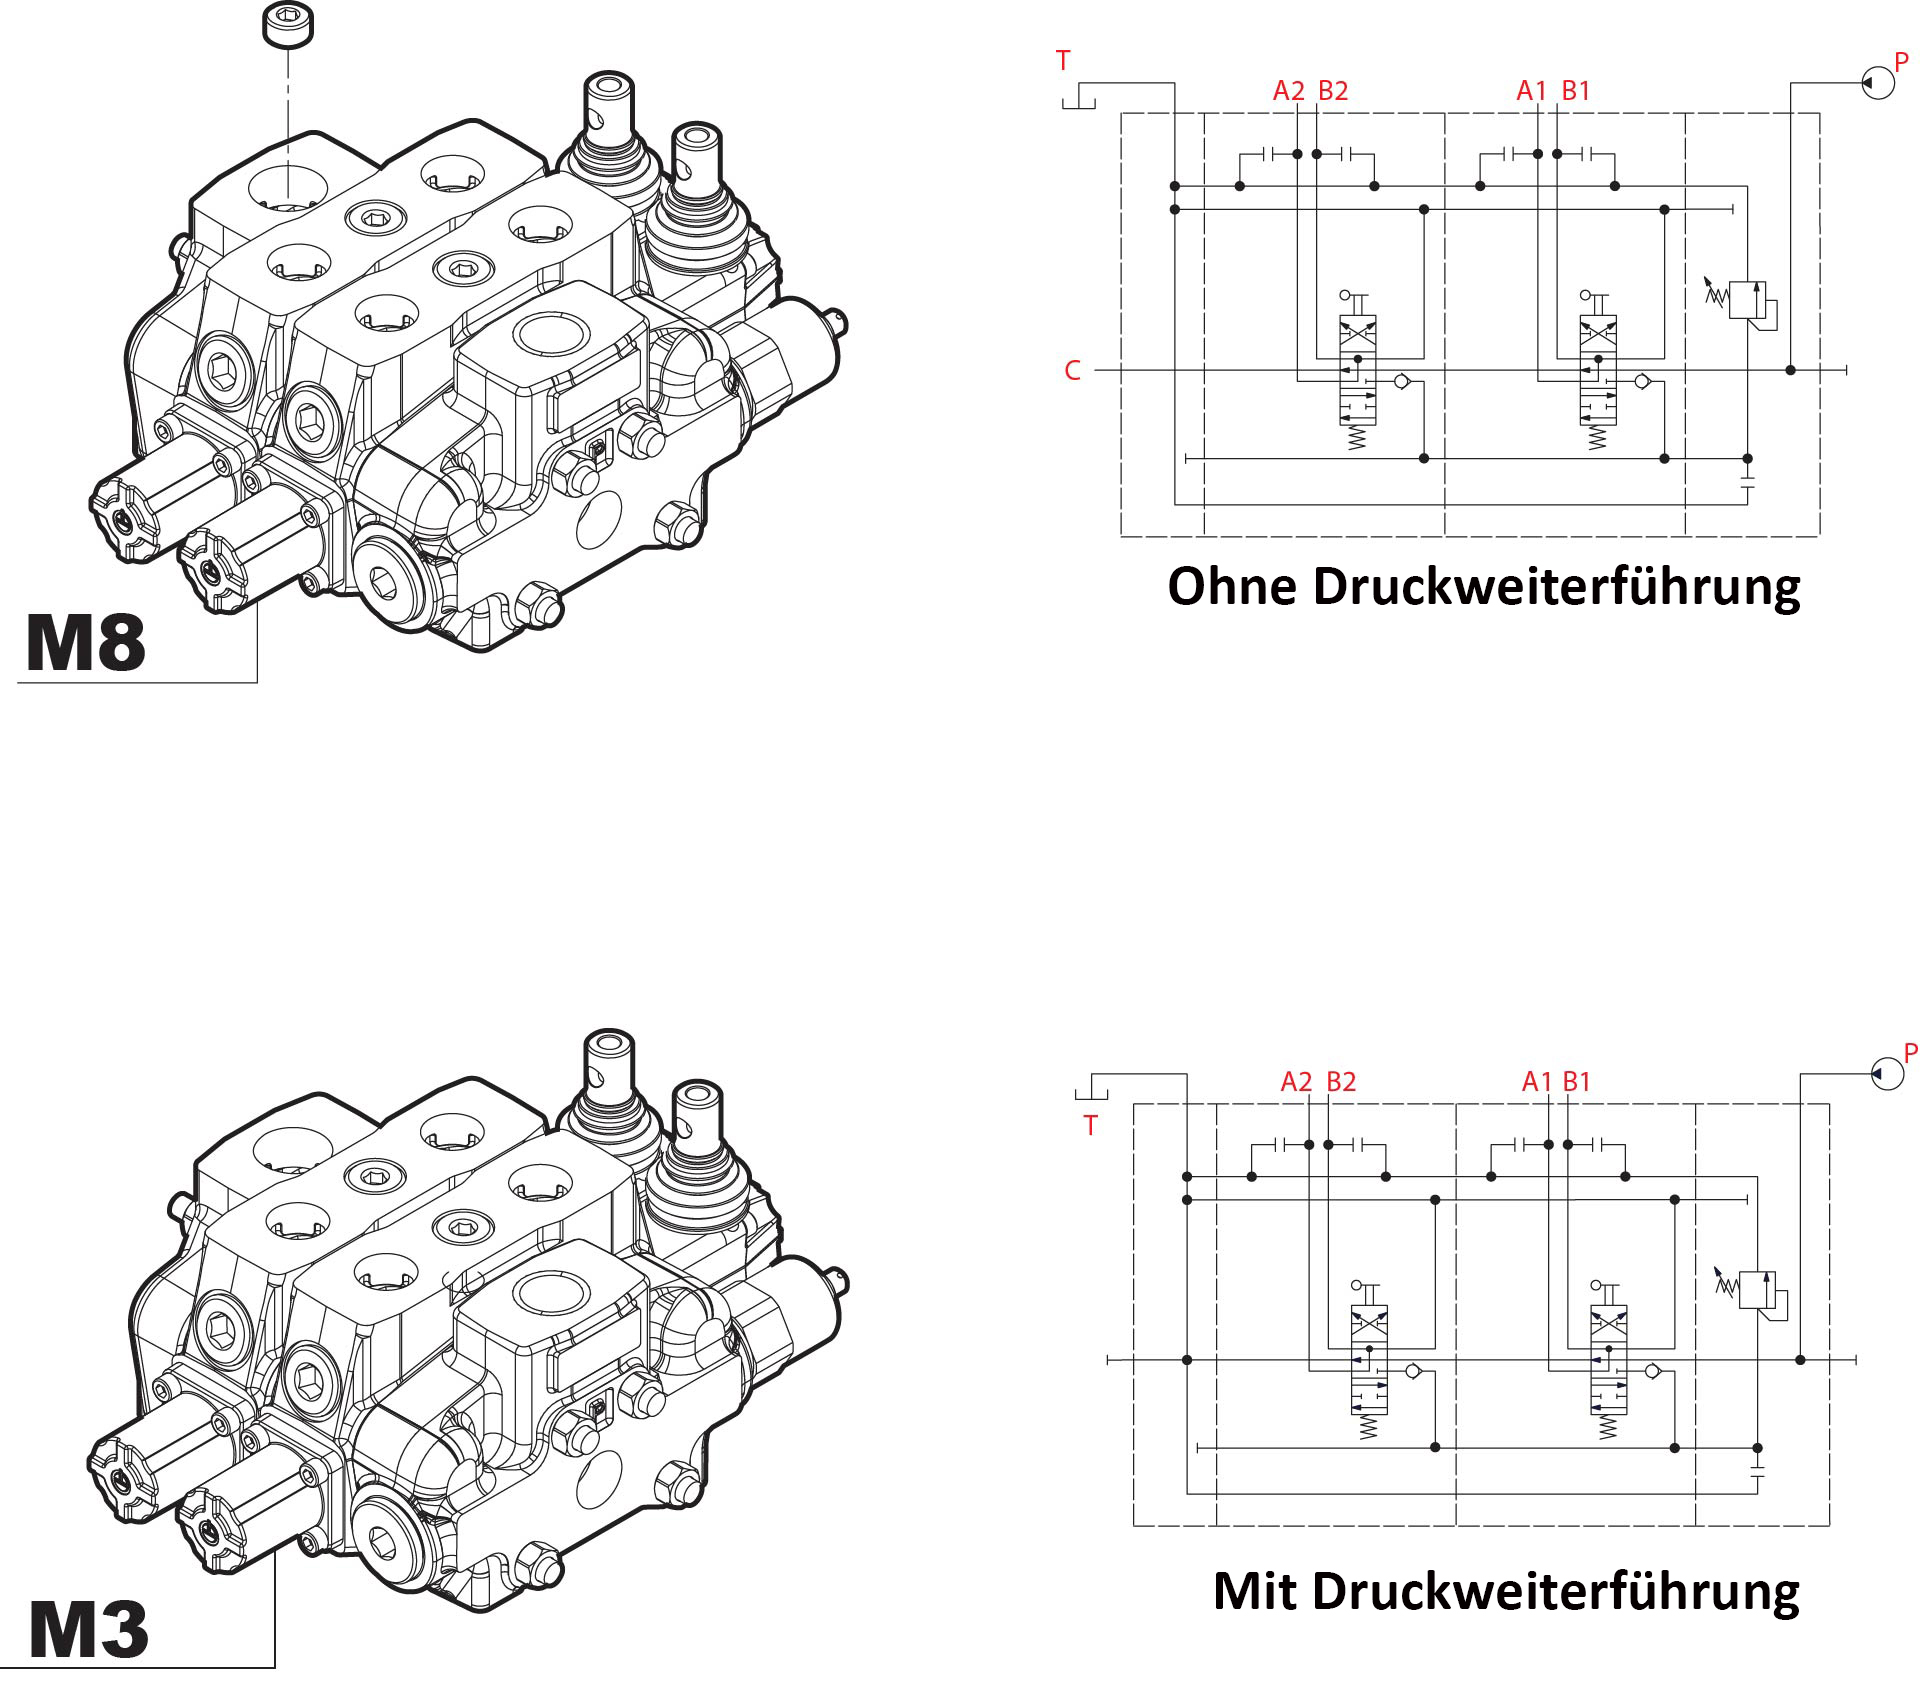 Lever Valve, Sectional valve, 140 Liter, Spring Centered, 6 Sections, with  Pressure Relief Valve PRV 175 bar